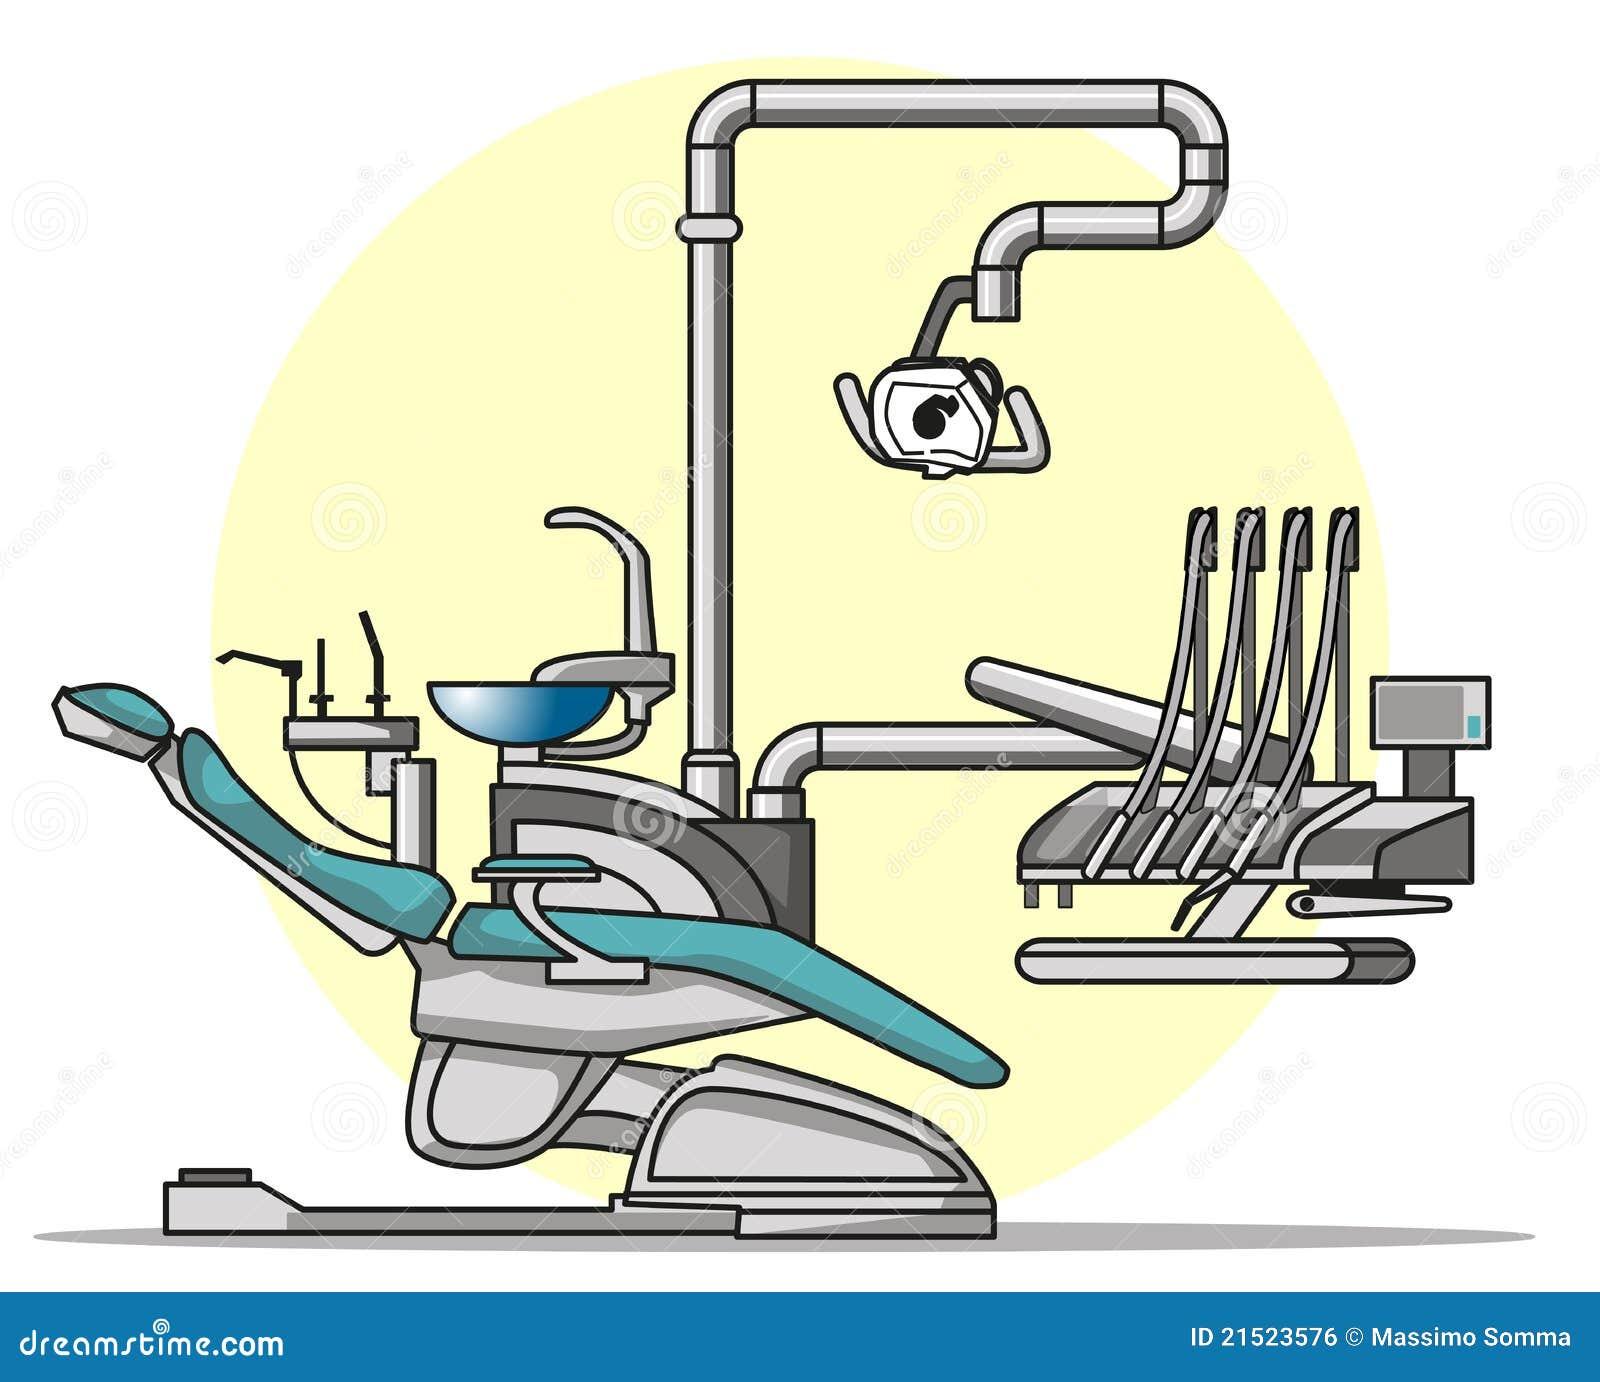 Cartoon Dentist Chair Royalty Free Stock Image - Image: 21523576